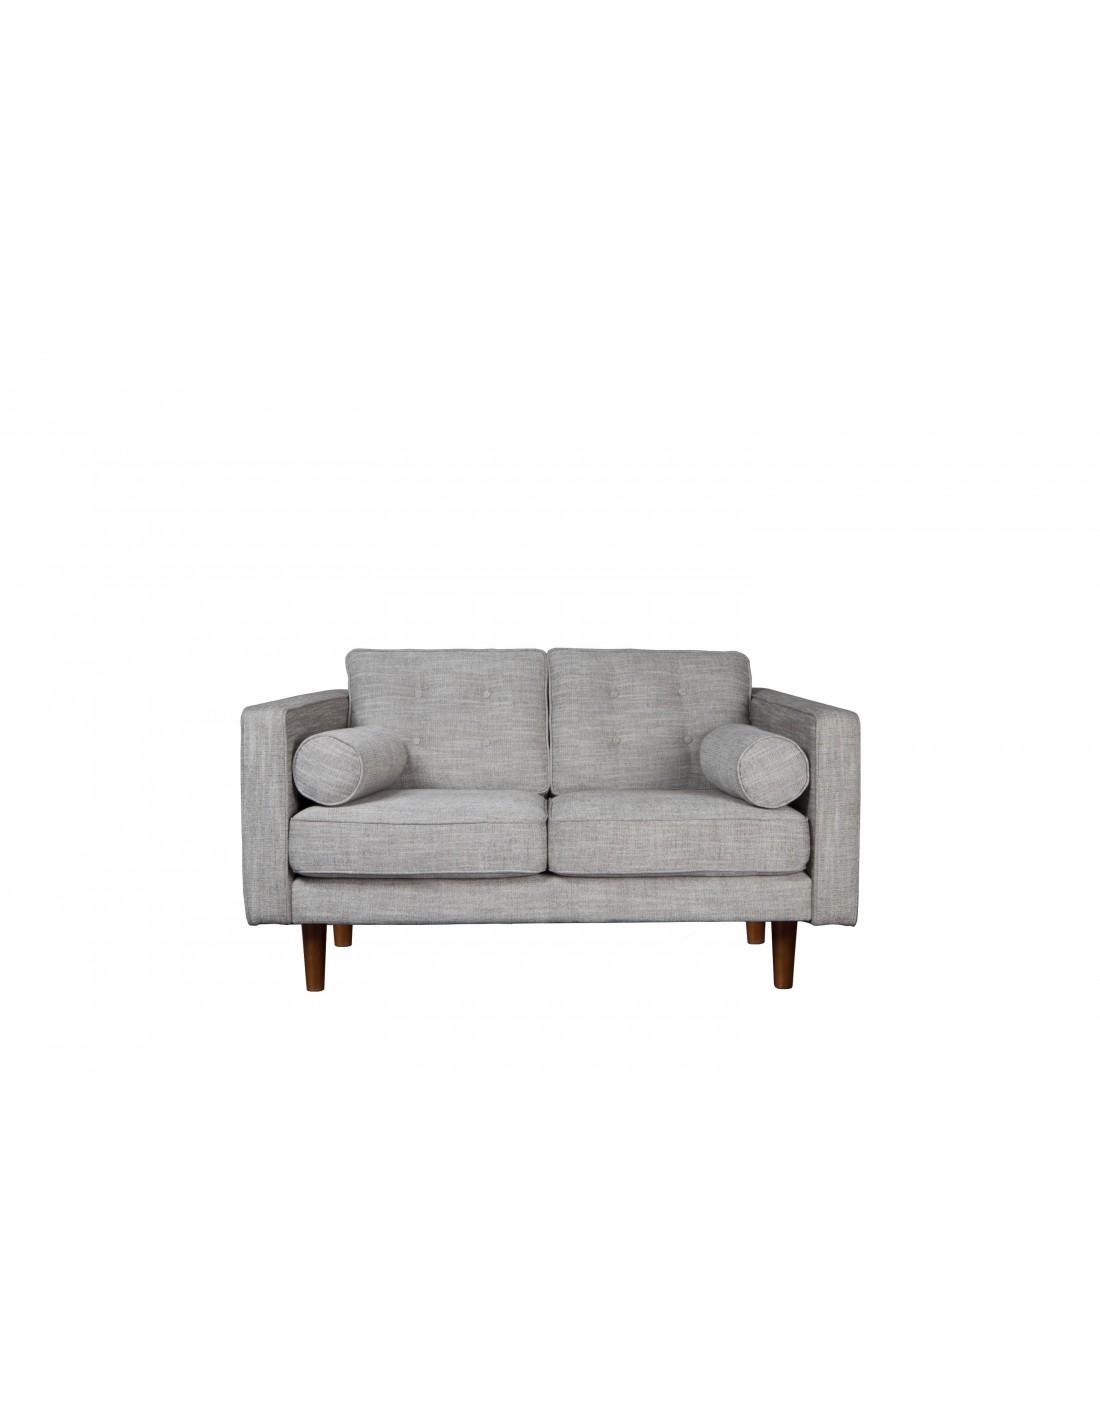 Sofa 2 seater Wheat  -  Nouveau -170-93-80cm